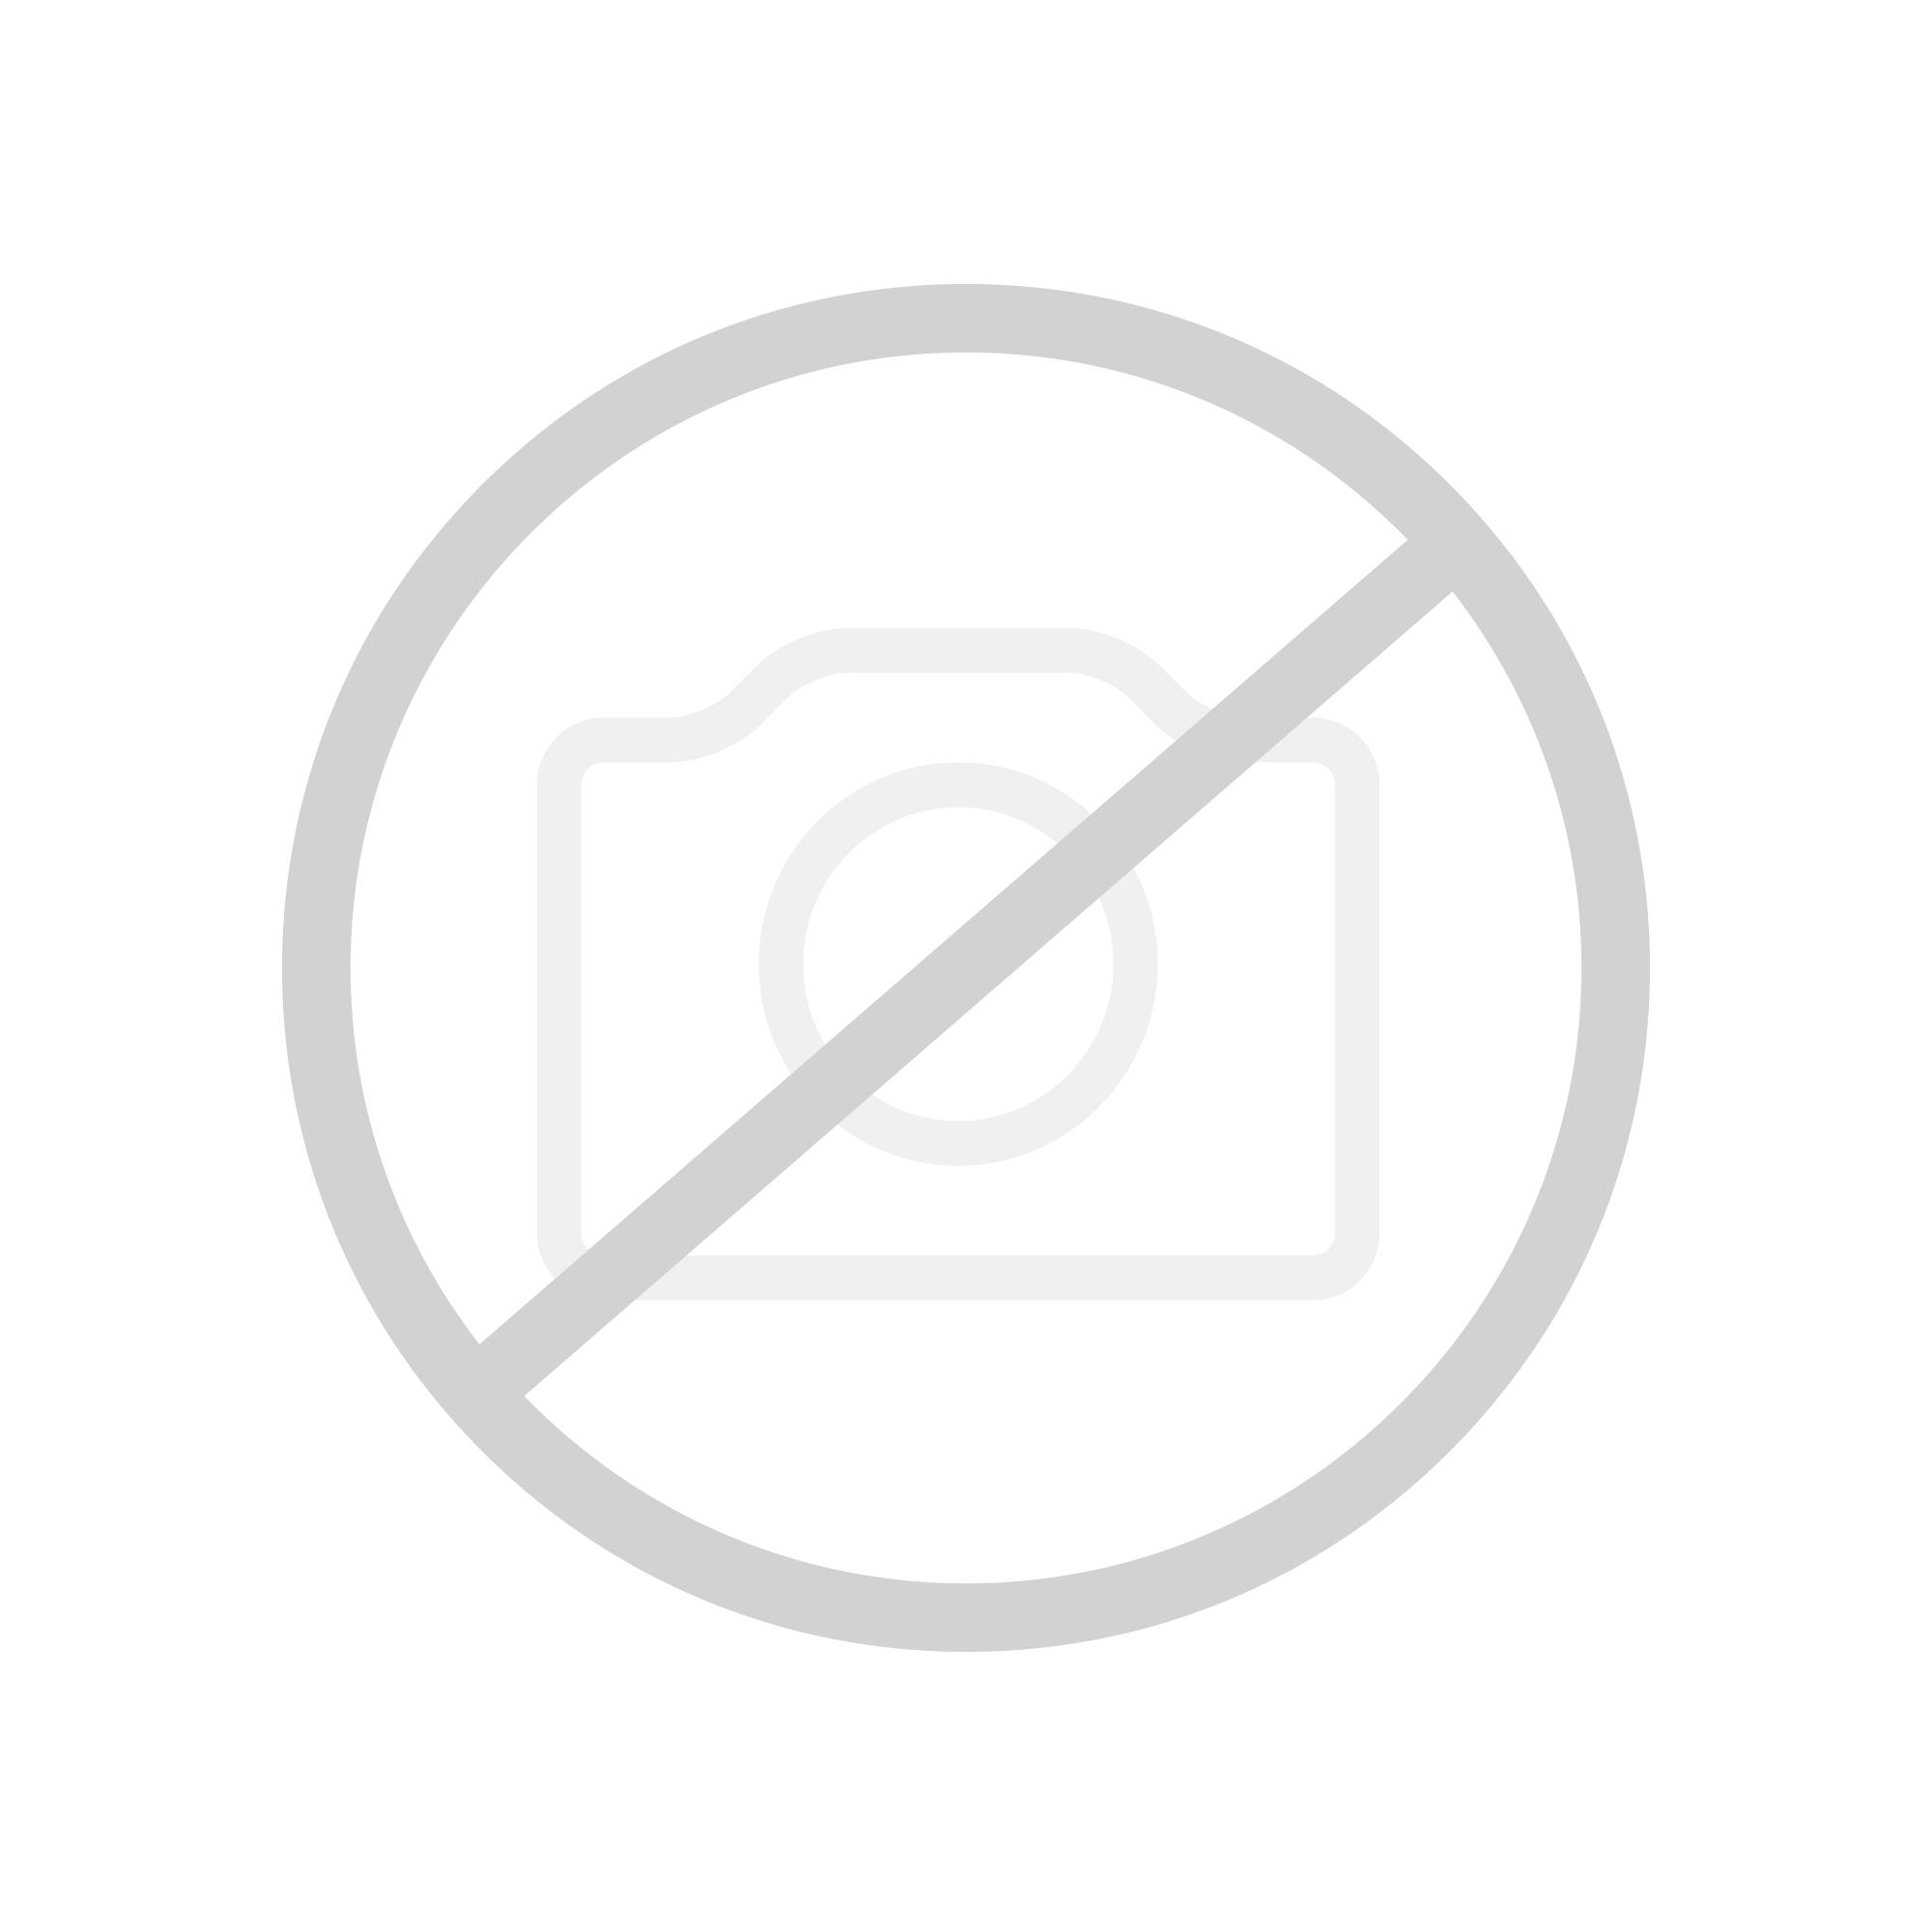 HSK ASP 500 Alu Spiegelschrank   1121045#TRLi | Reuter Onlineshop